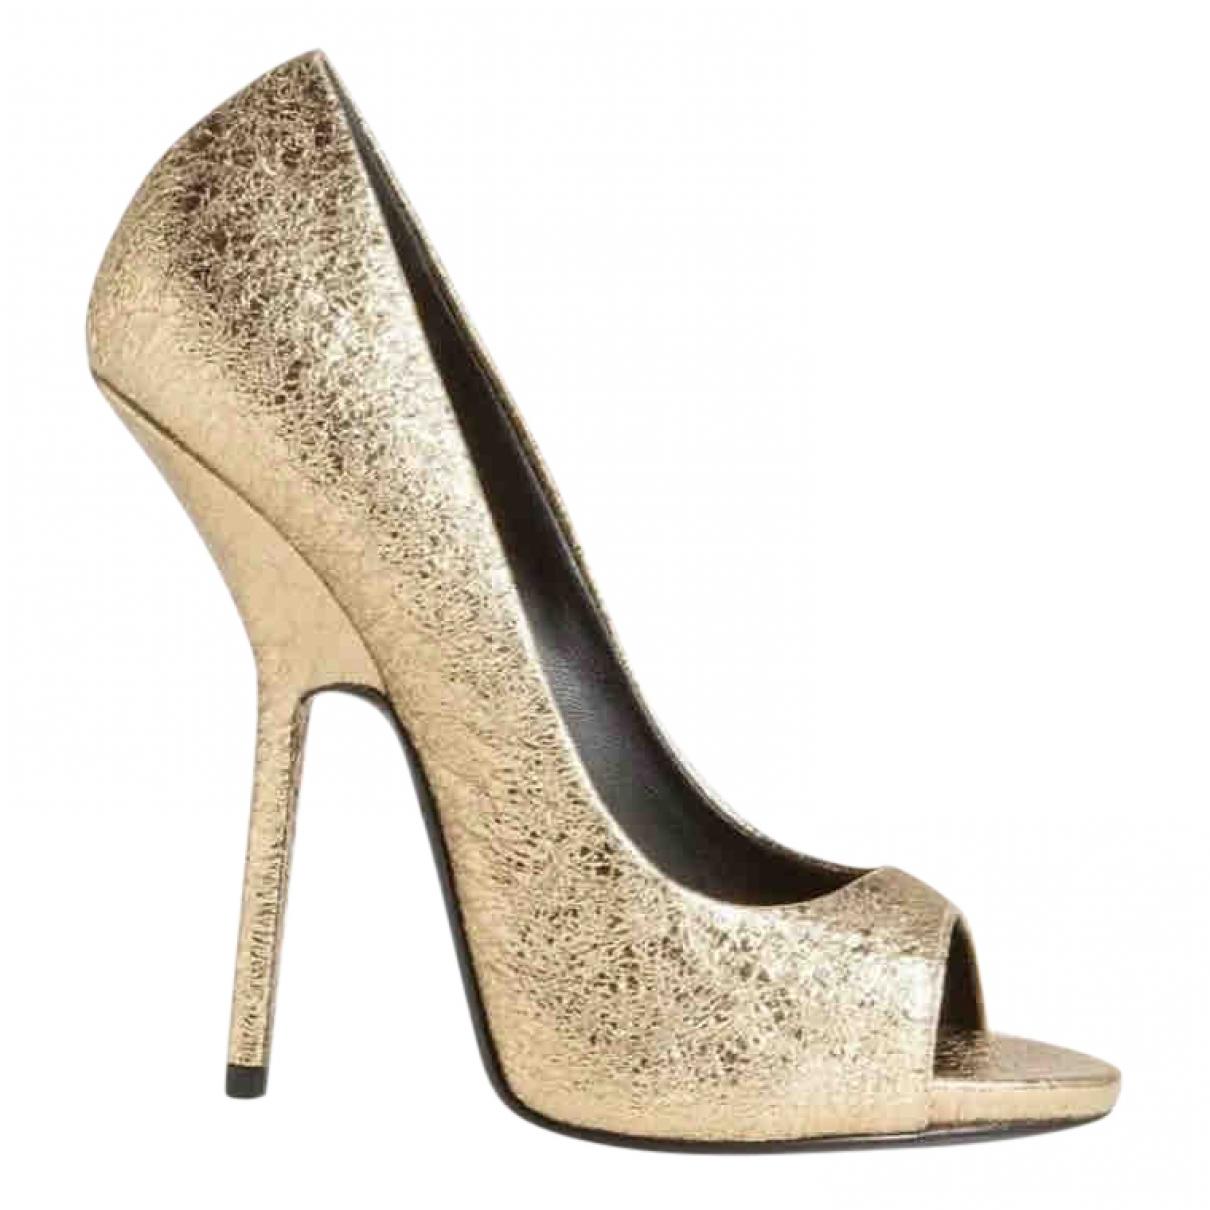 Giuseppe Zanotti \N Gold Patent leather Heels for Women 36 EU